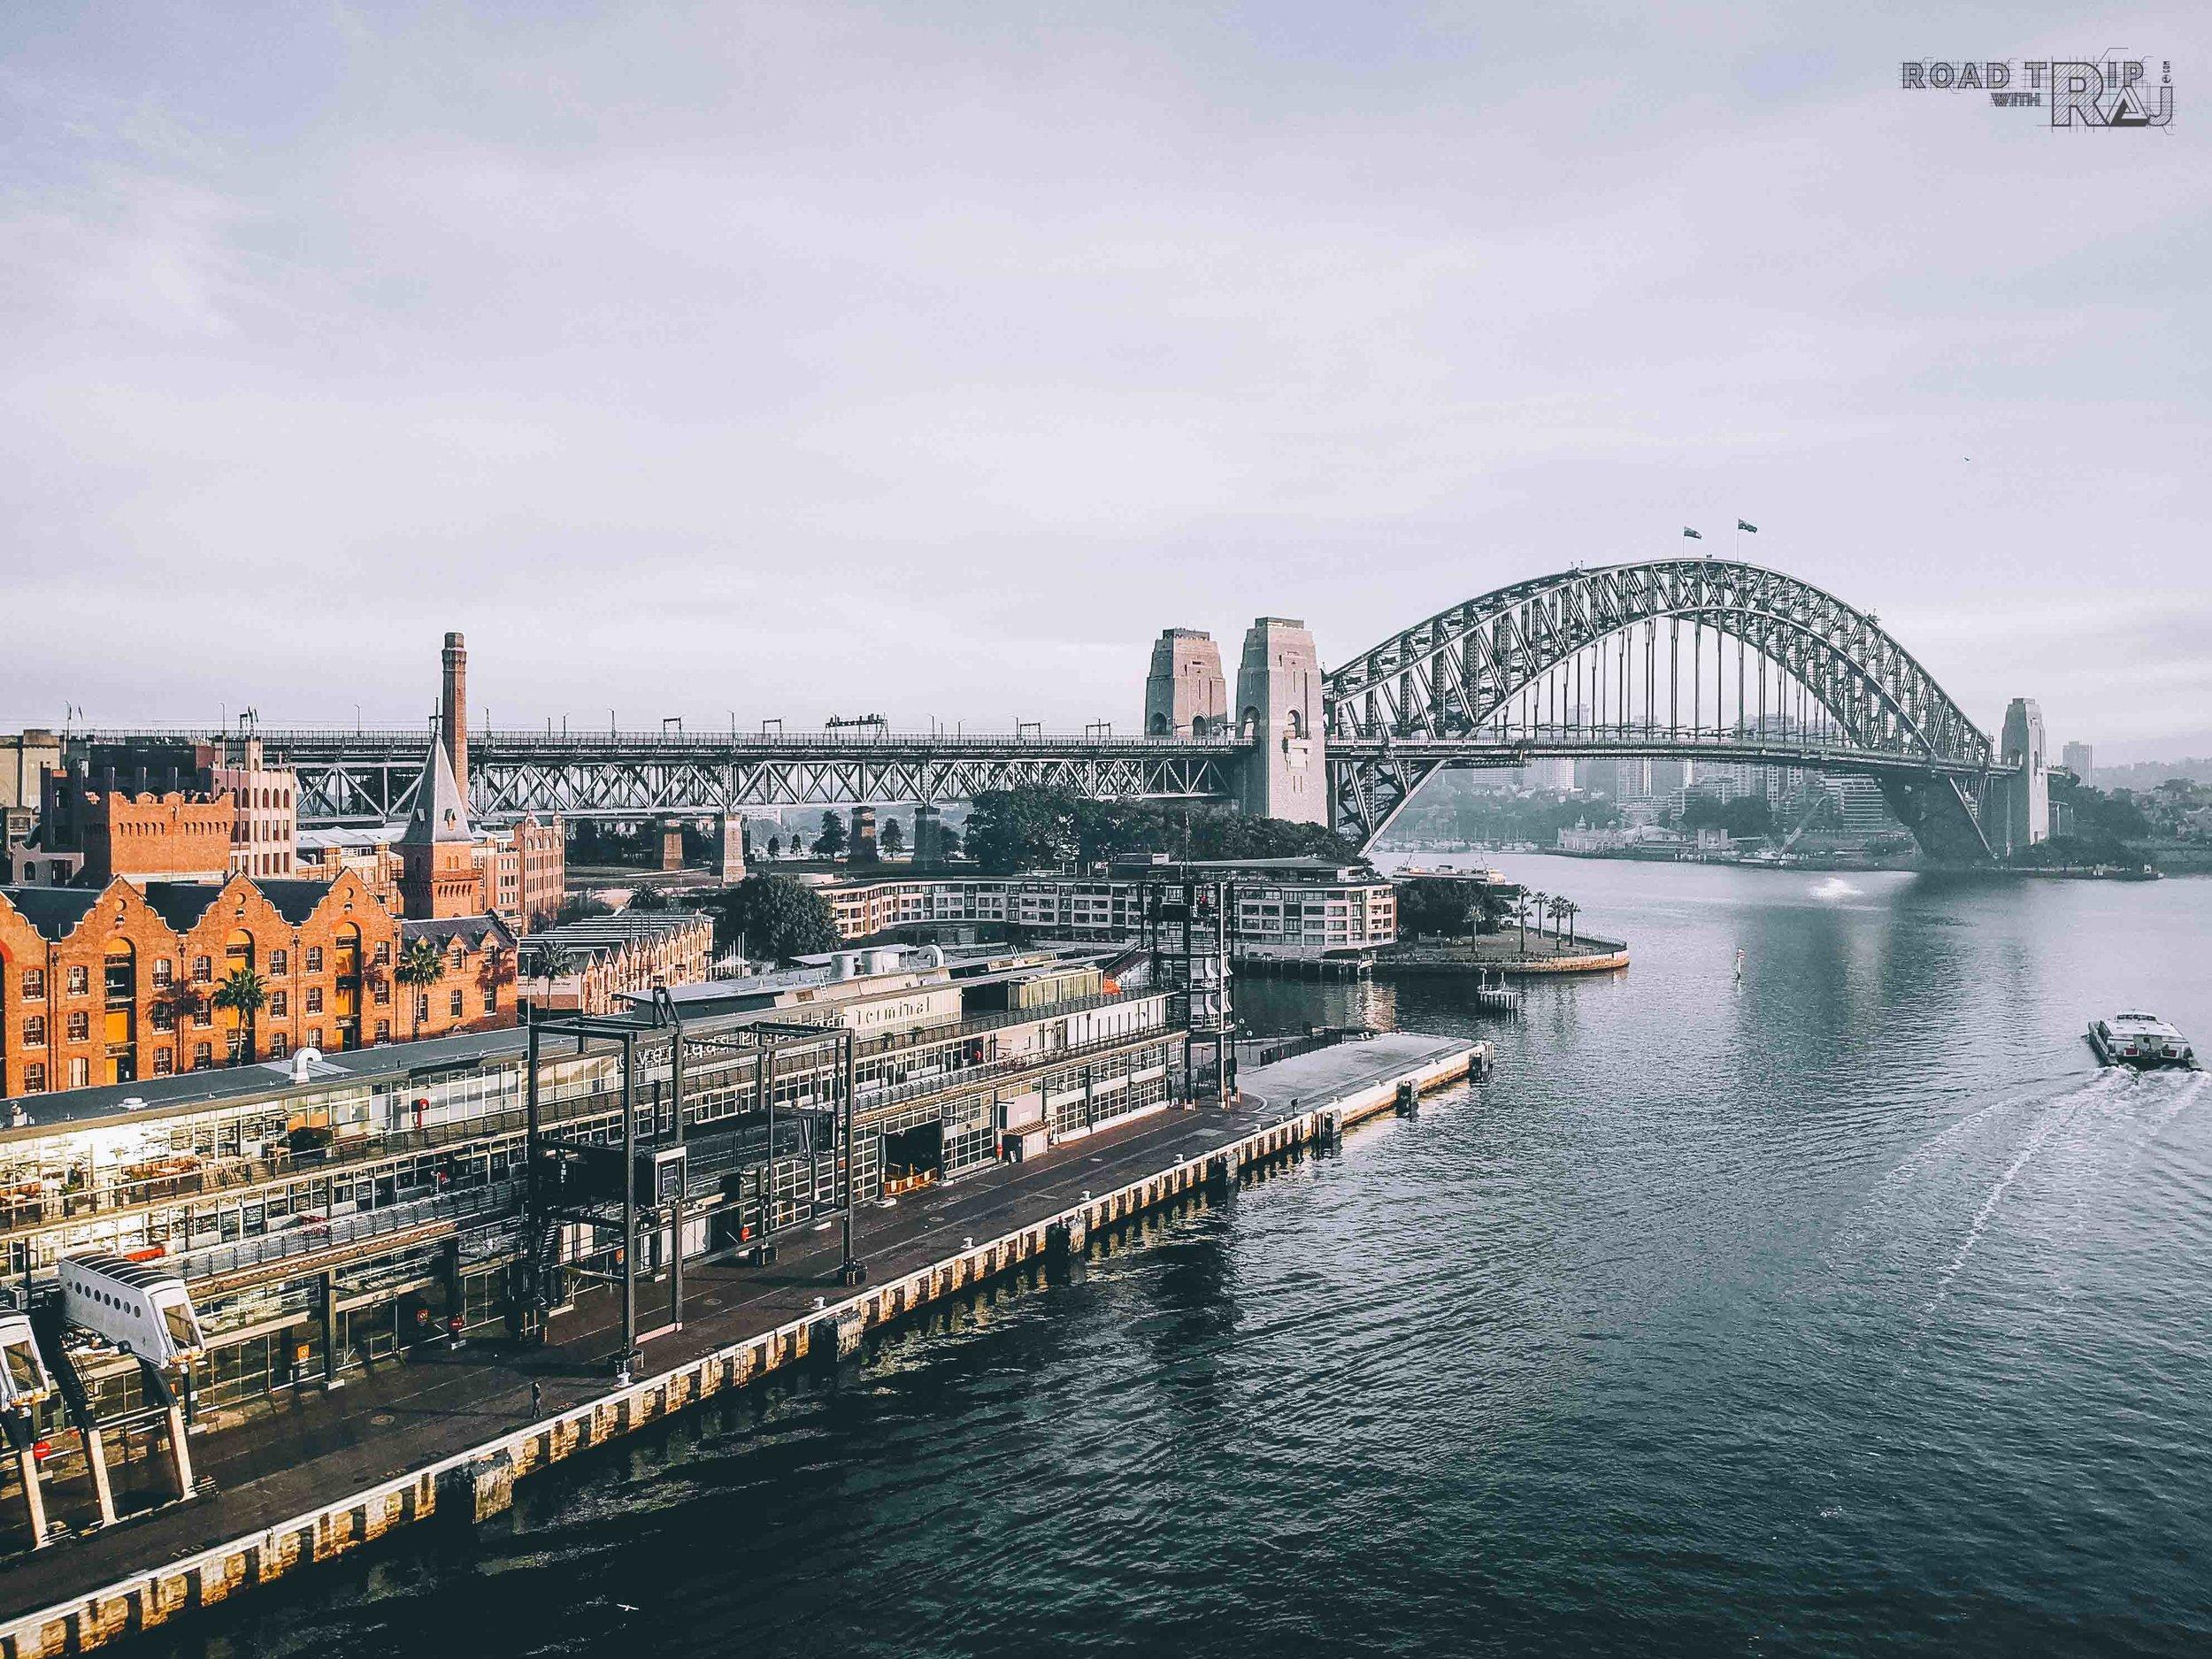 Sydney-bridge-the-city's-landmark.jpg